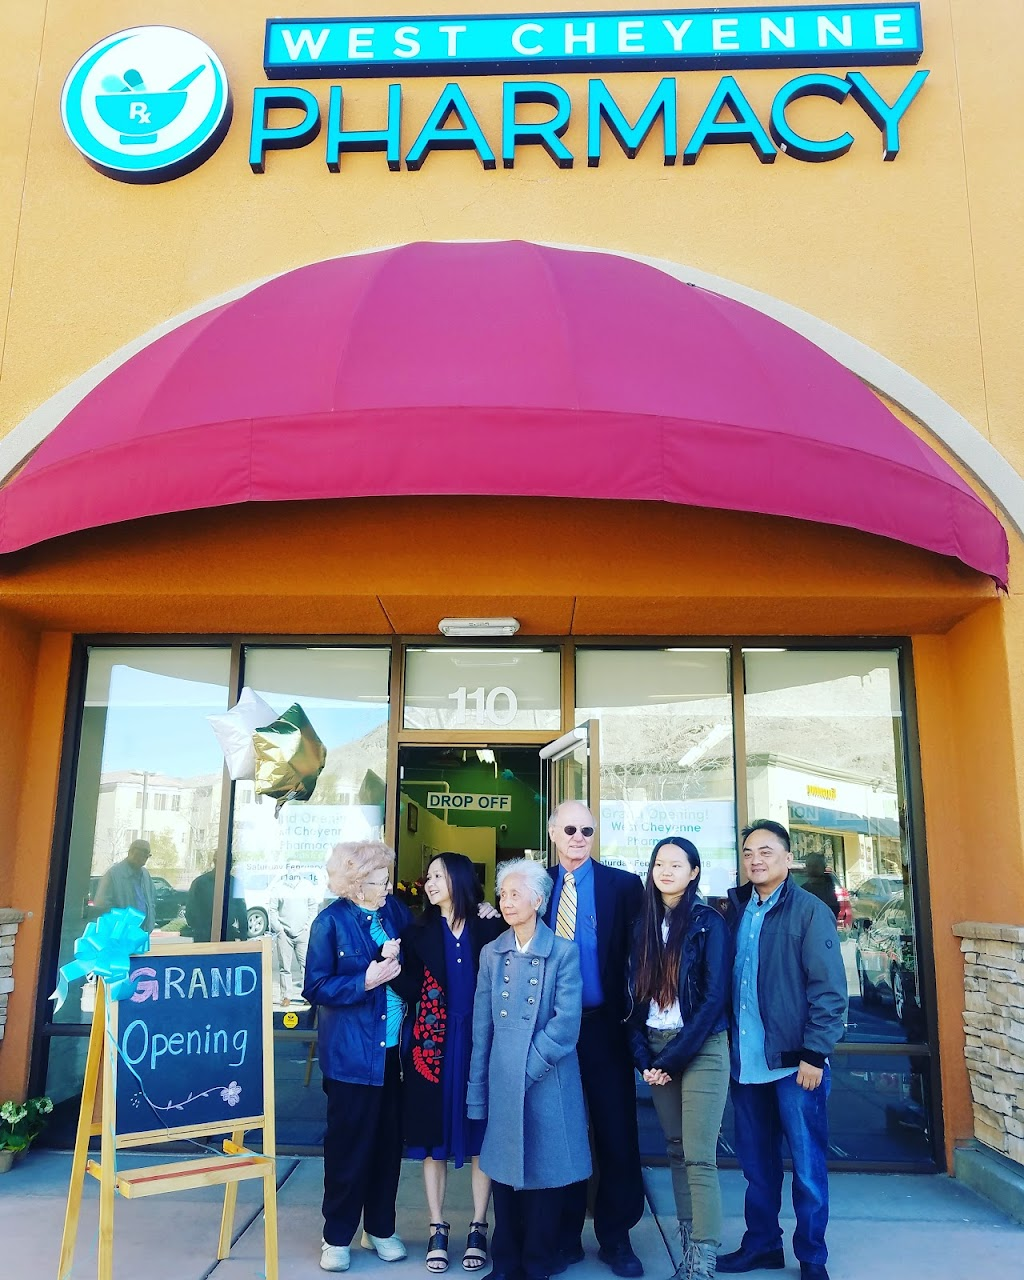 West Cheyenne Pharmacy - pharmacy    Photo 1 of 8   Address: 3350 Novat St suite 110, Las Vegas, NV 89129, USA   Phone: (702) 395-3004